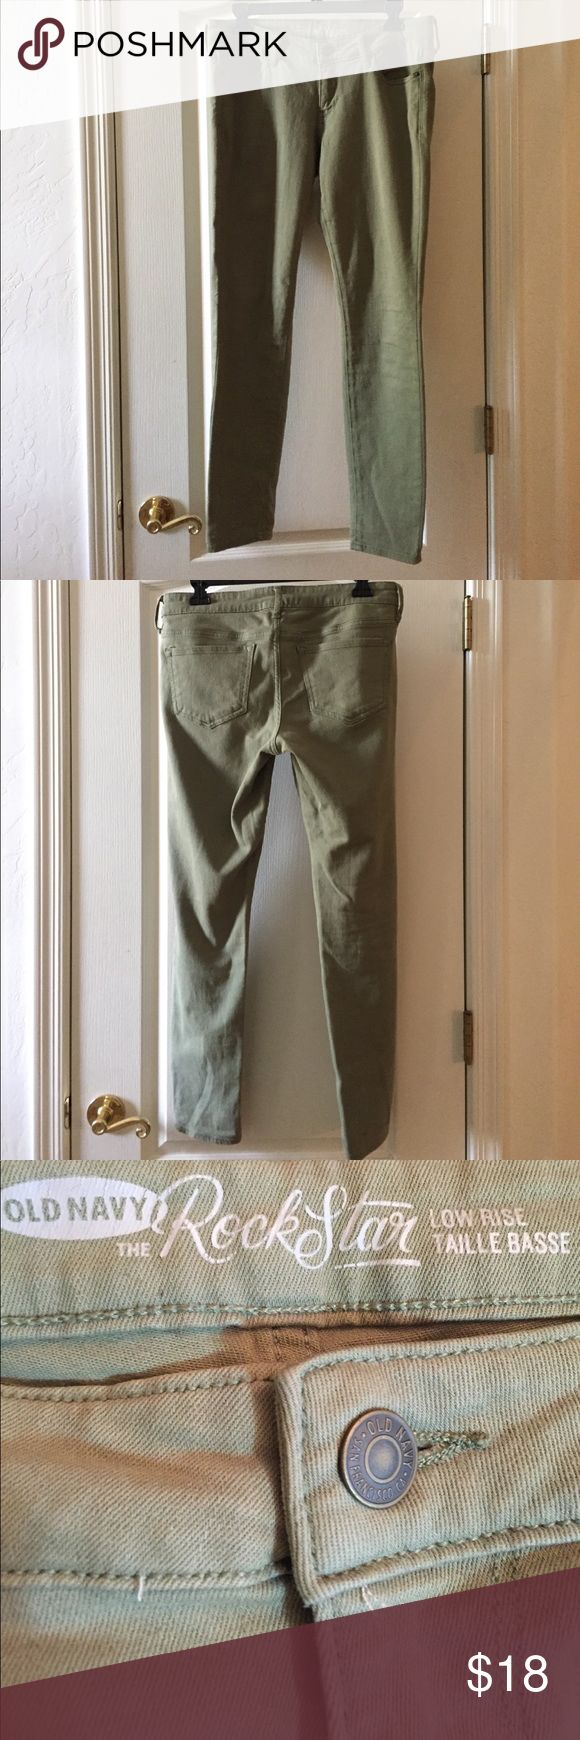 Selling this Old Navy Rockstar Jeans on Poshmark! My username is: jessfenzel. #shopmycloset #poshmark #fashion #shopping #style #forsale #Old Navy #Denim